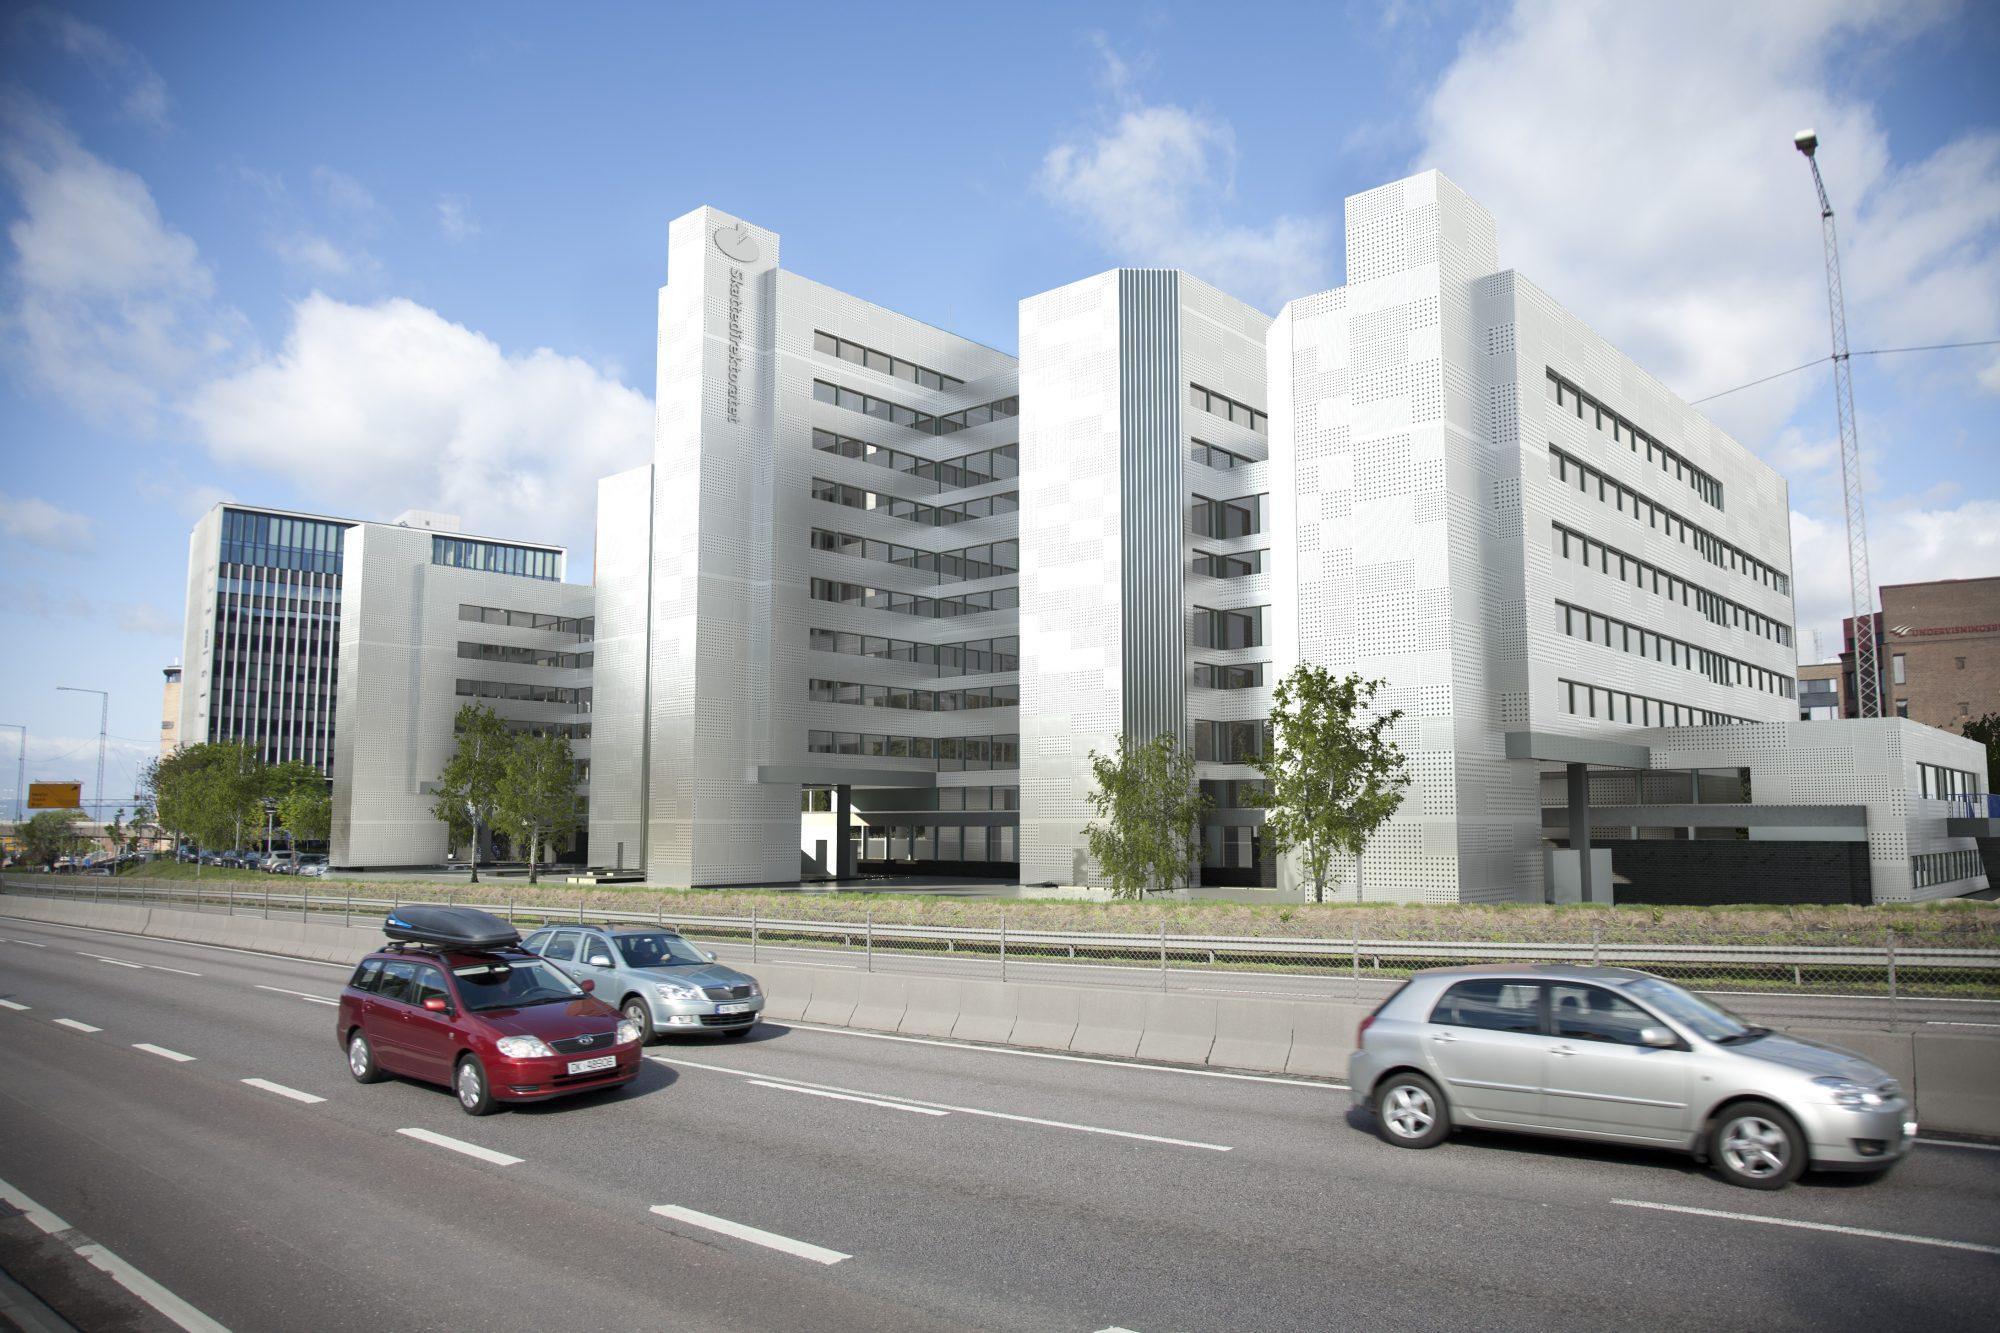 Fredrik Selmers vei 4 (LPO Arkitekter)